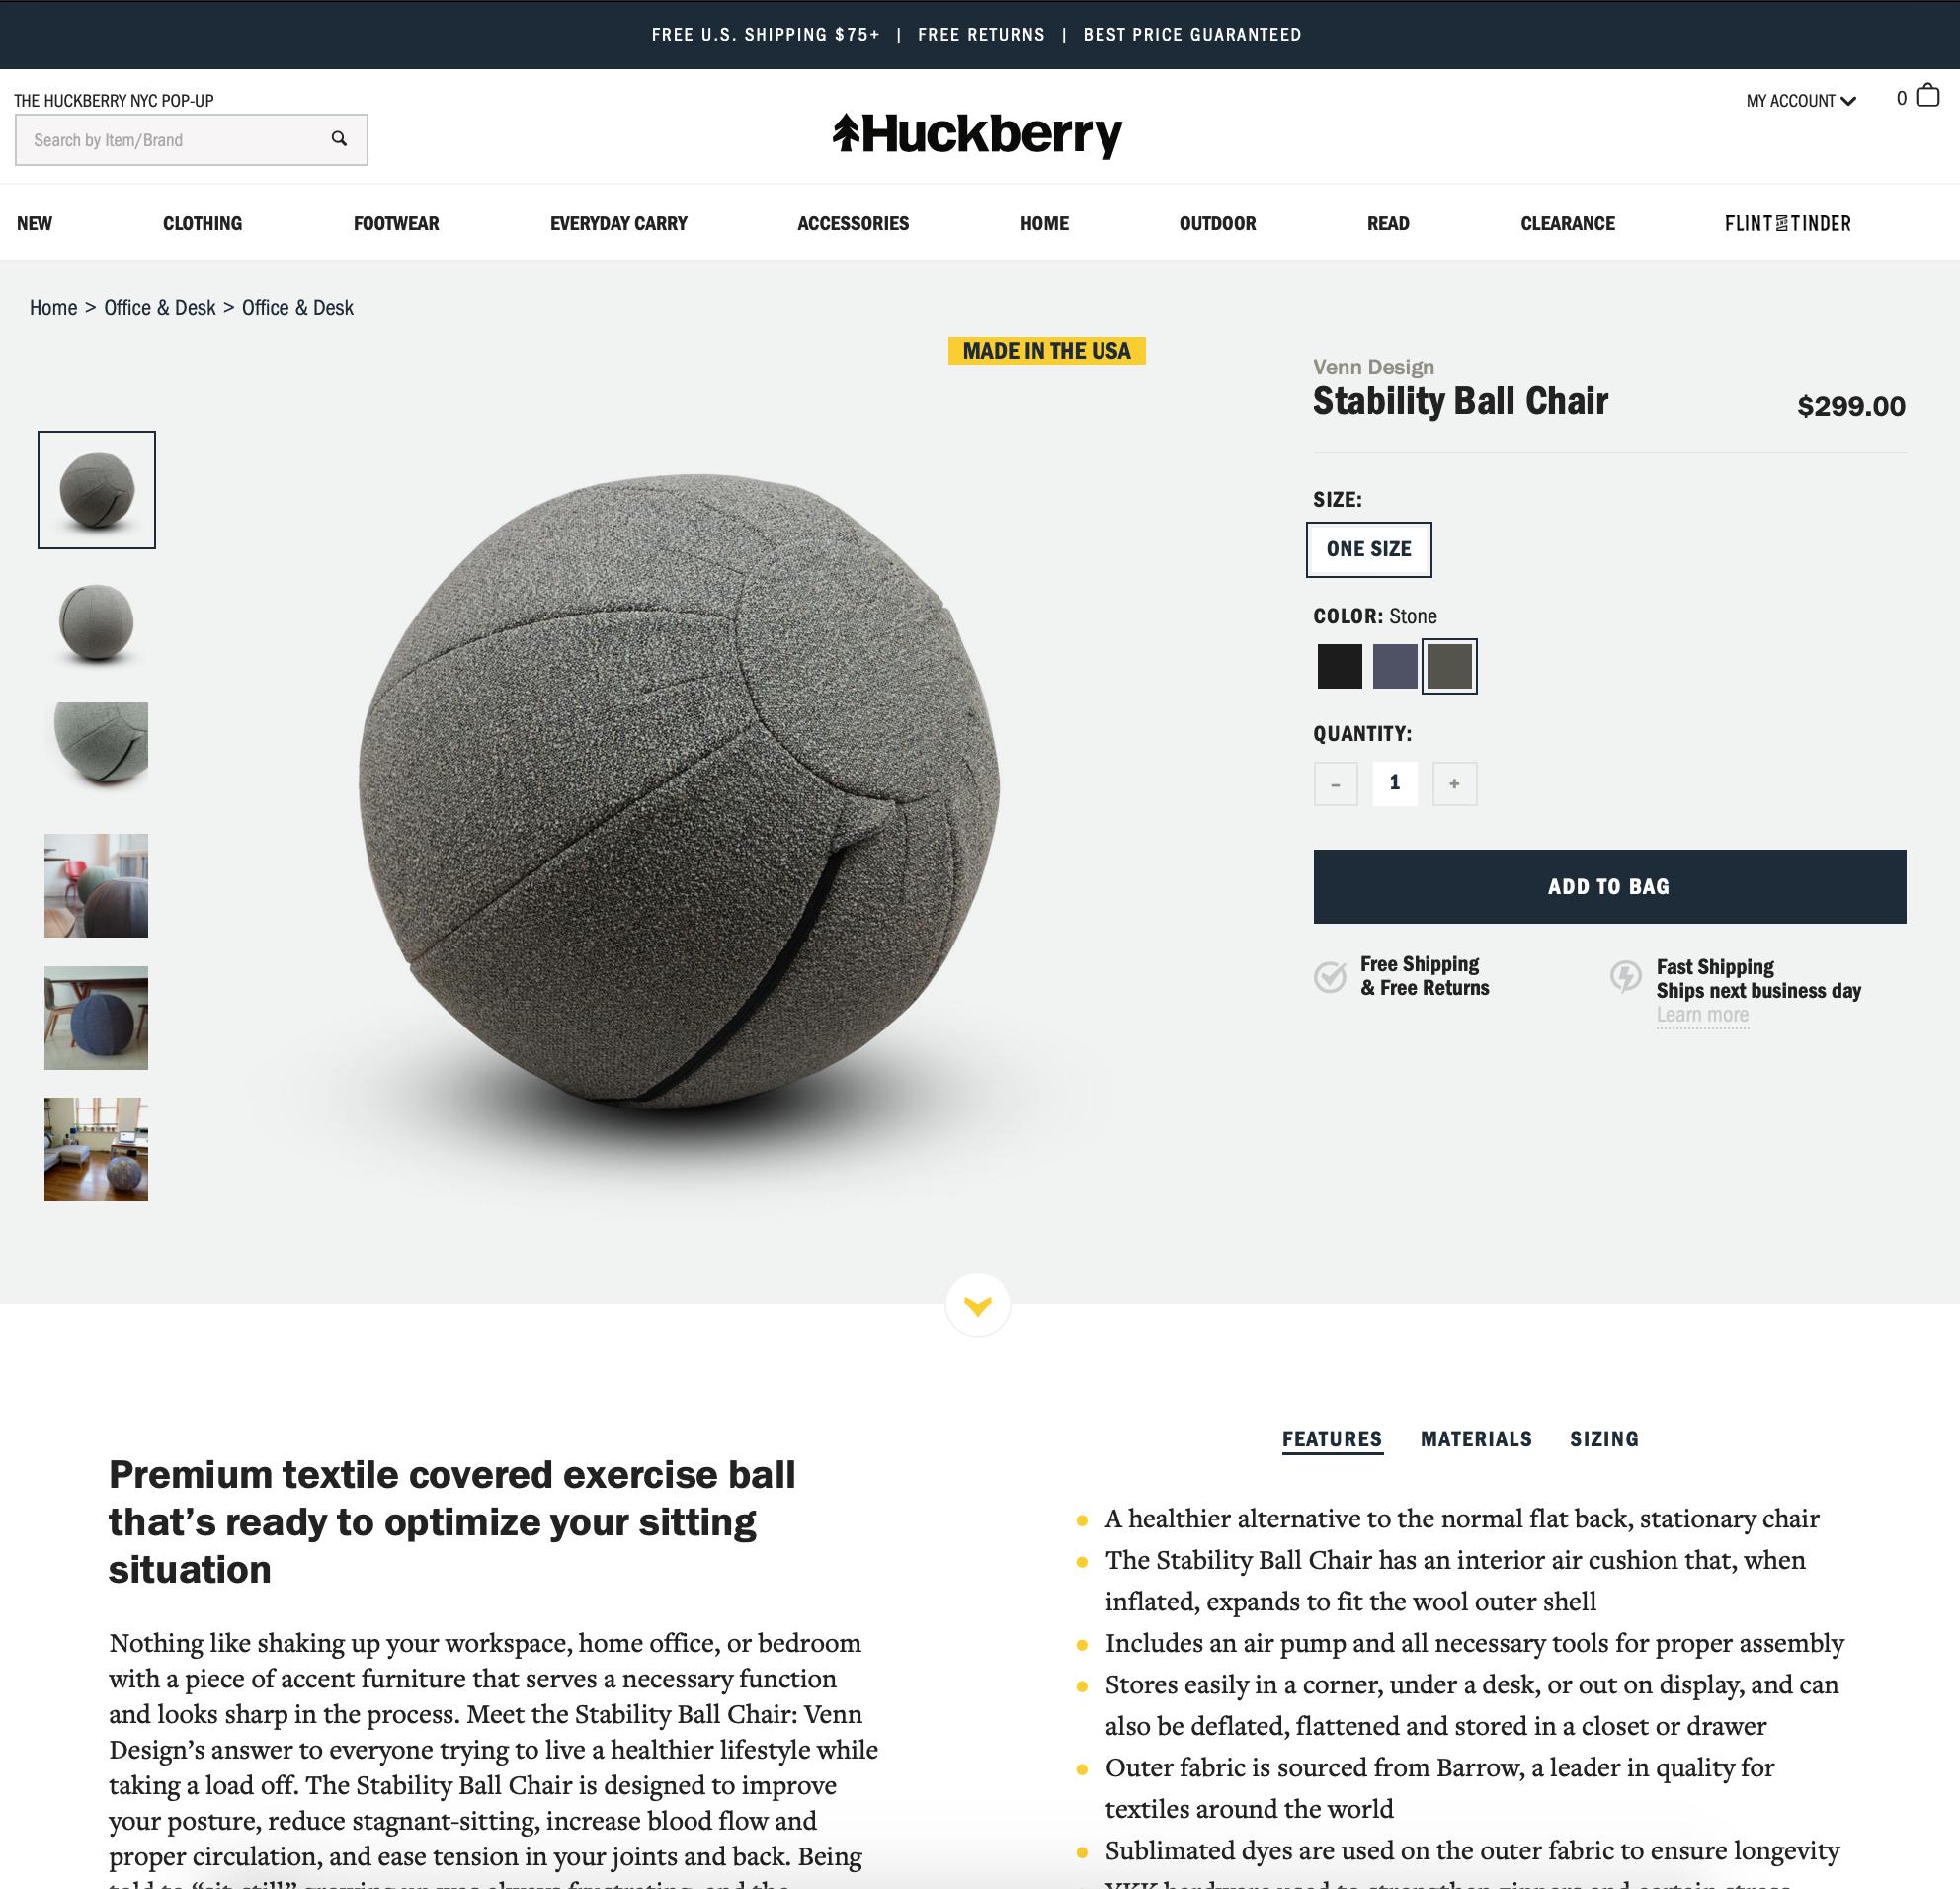 Venn Design 2 on Huckberry.com.png